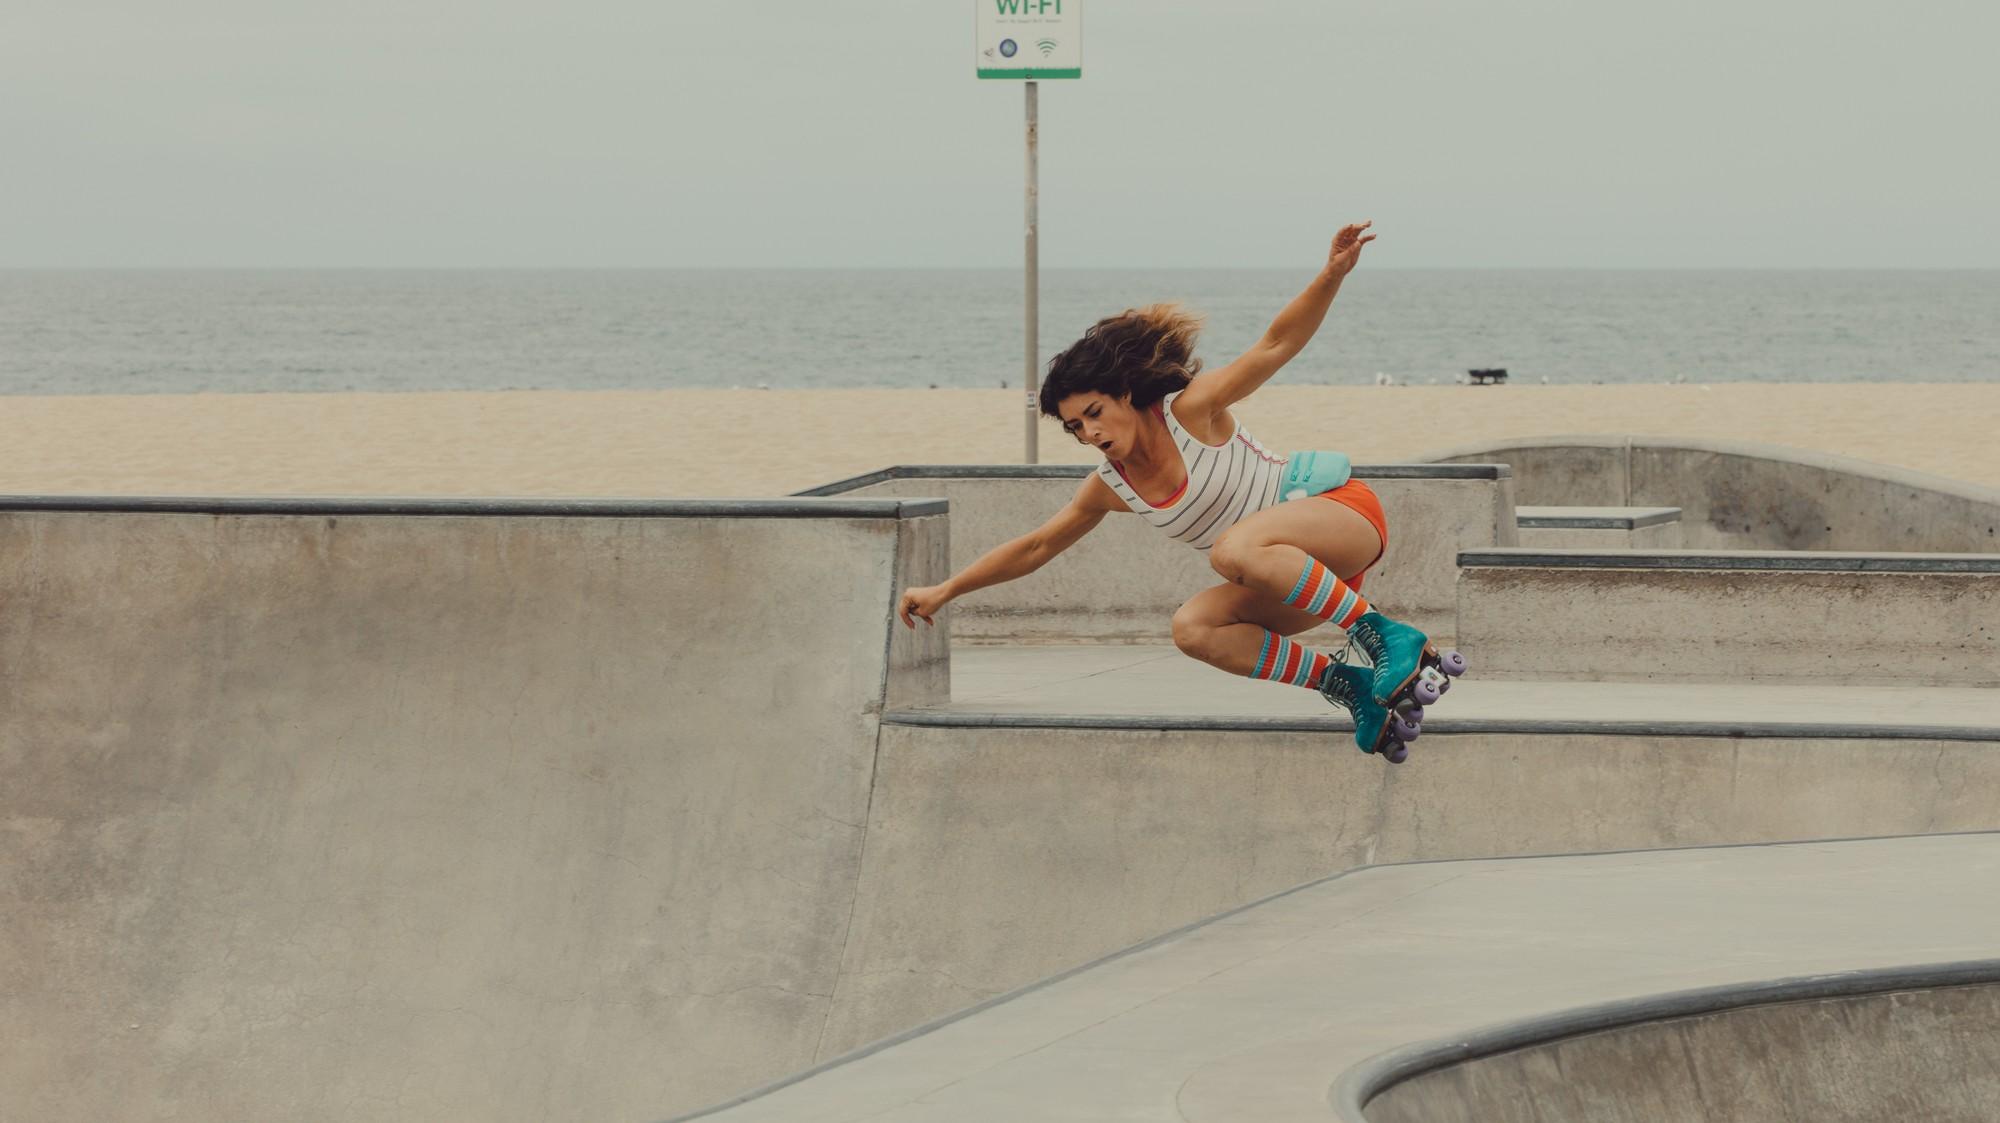 I Cruised LA with the Badass Moxi Roller Skating Girl Gang